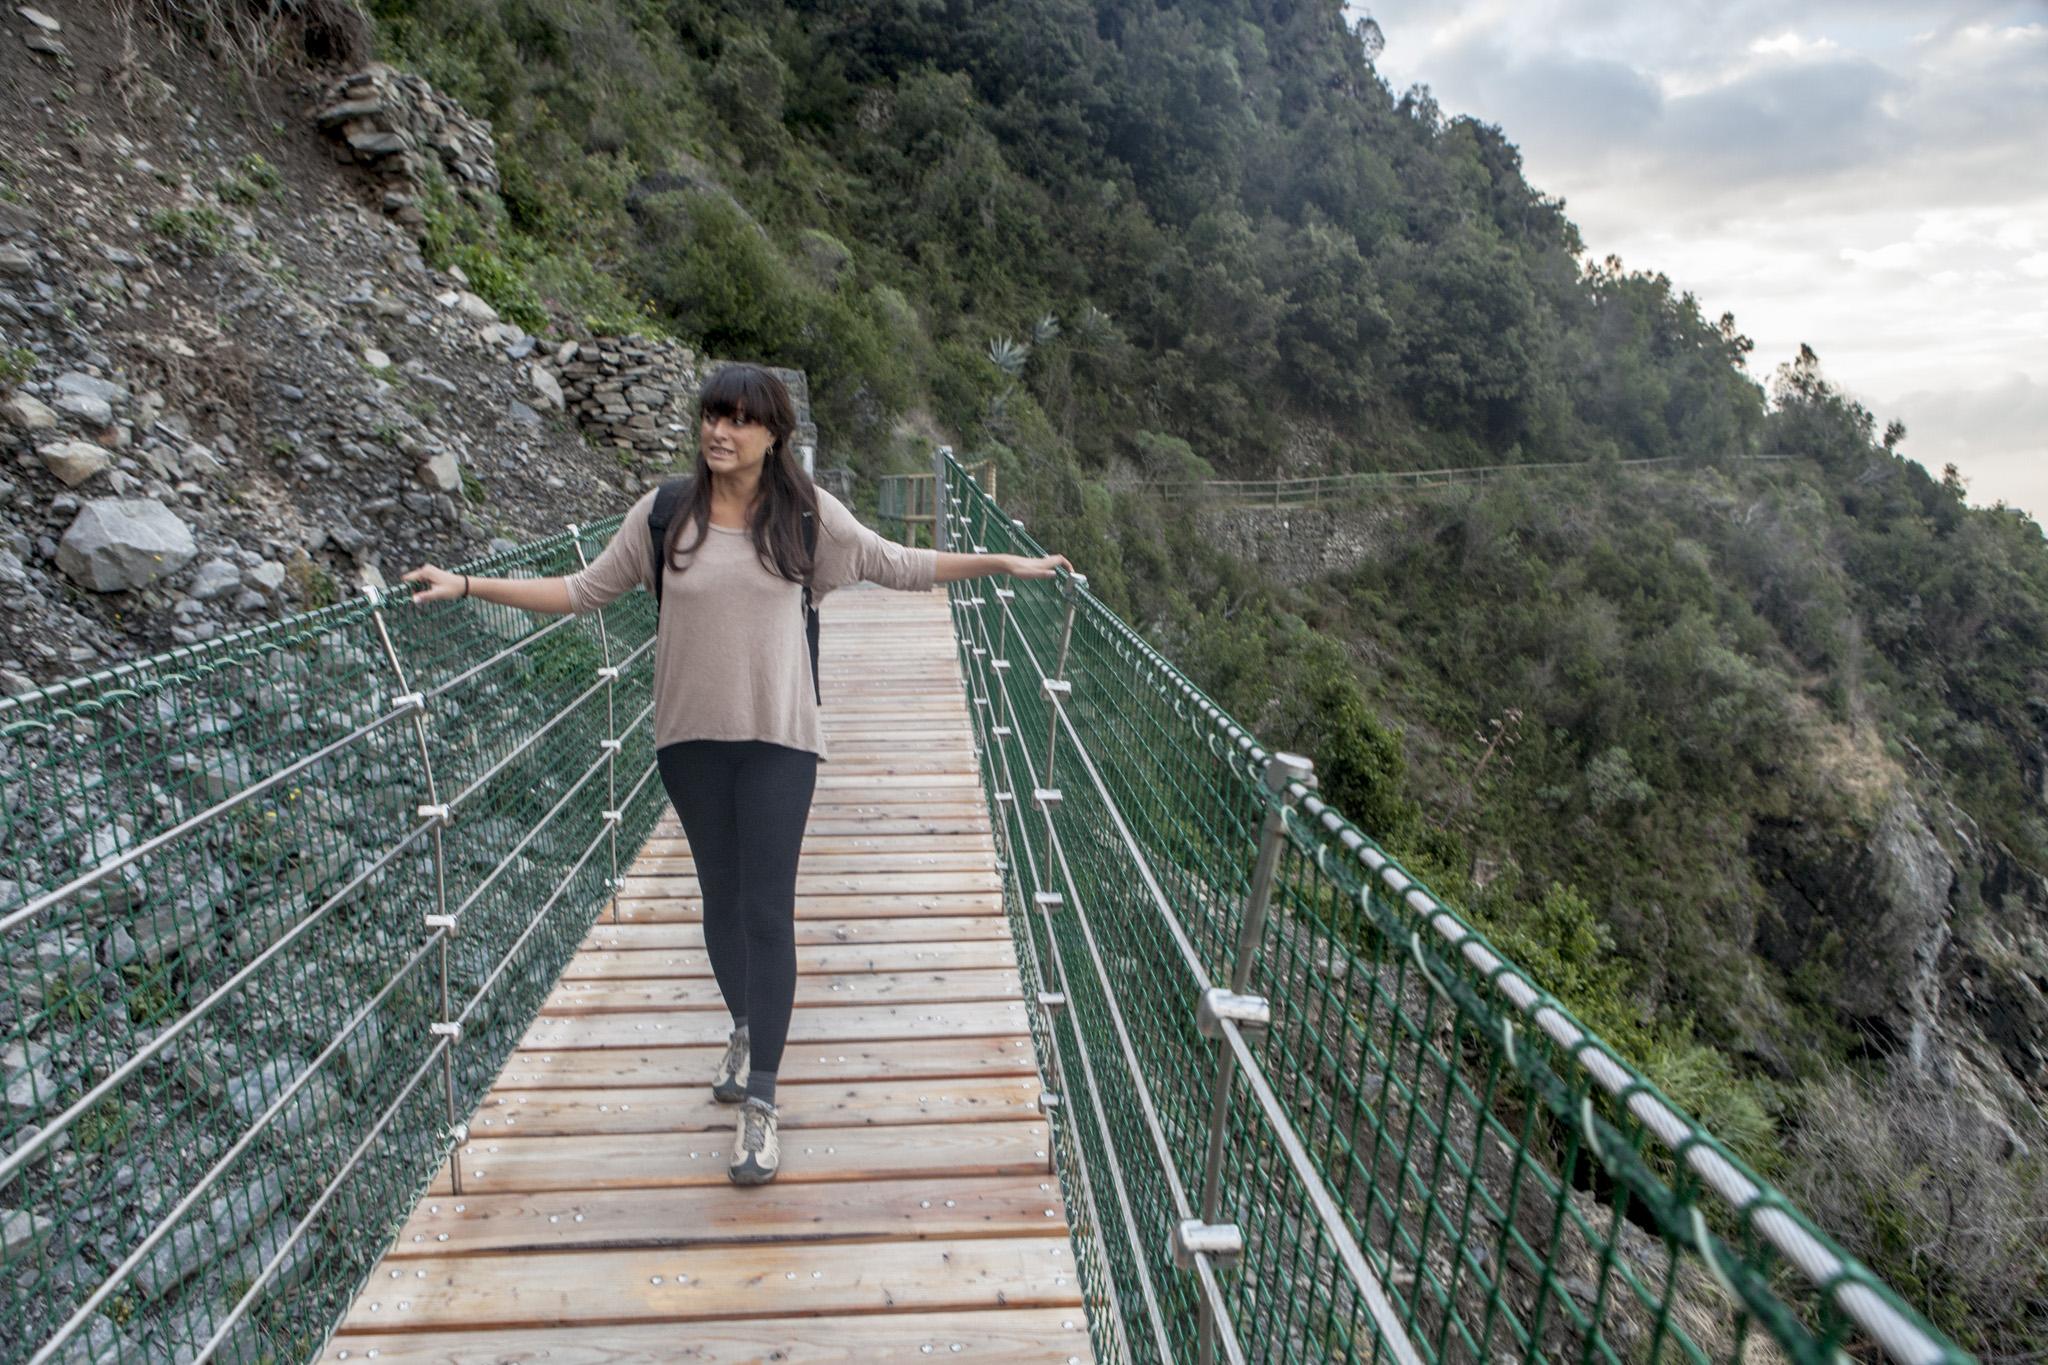 State-of-the-art suspension bridge over the remnants of a recent landslide